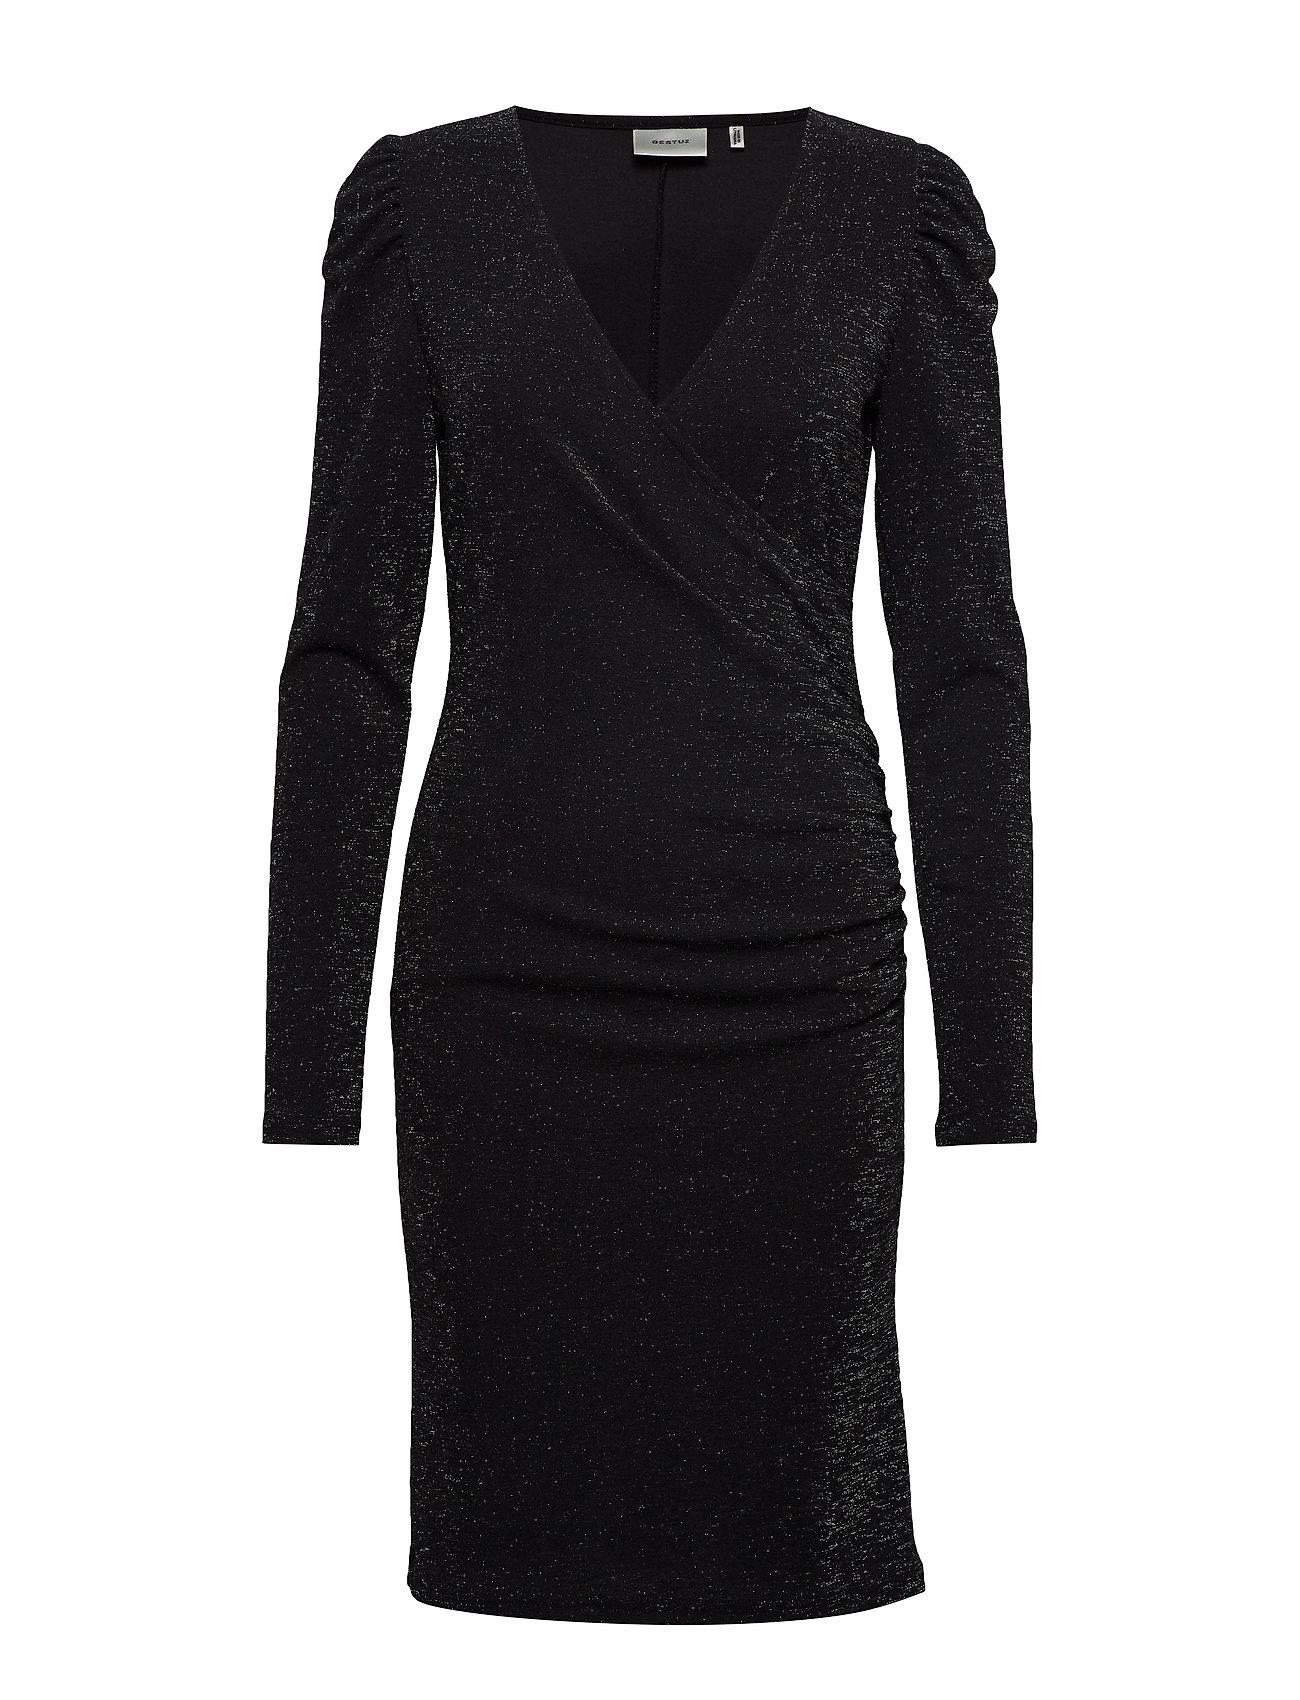 Gestuz SolinGZ dress YE19 - BLACK